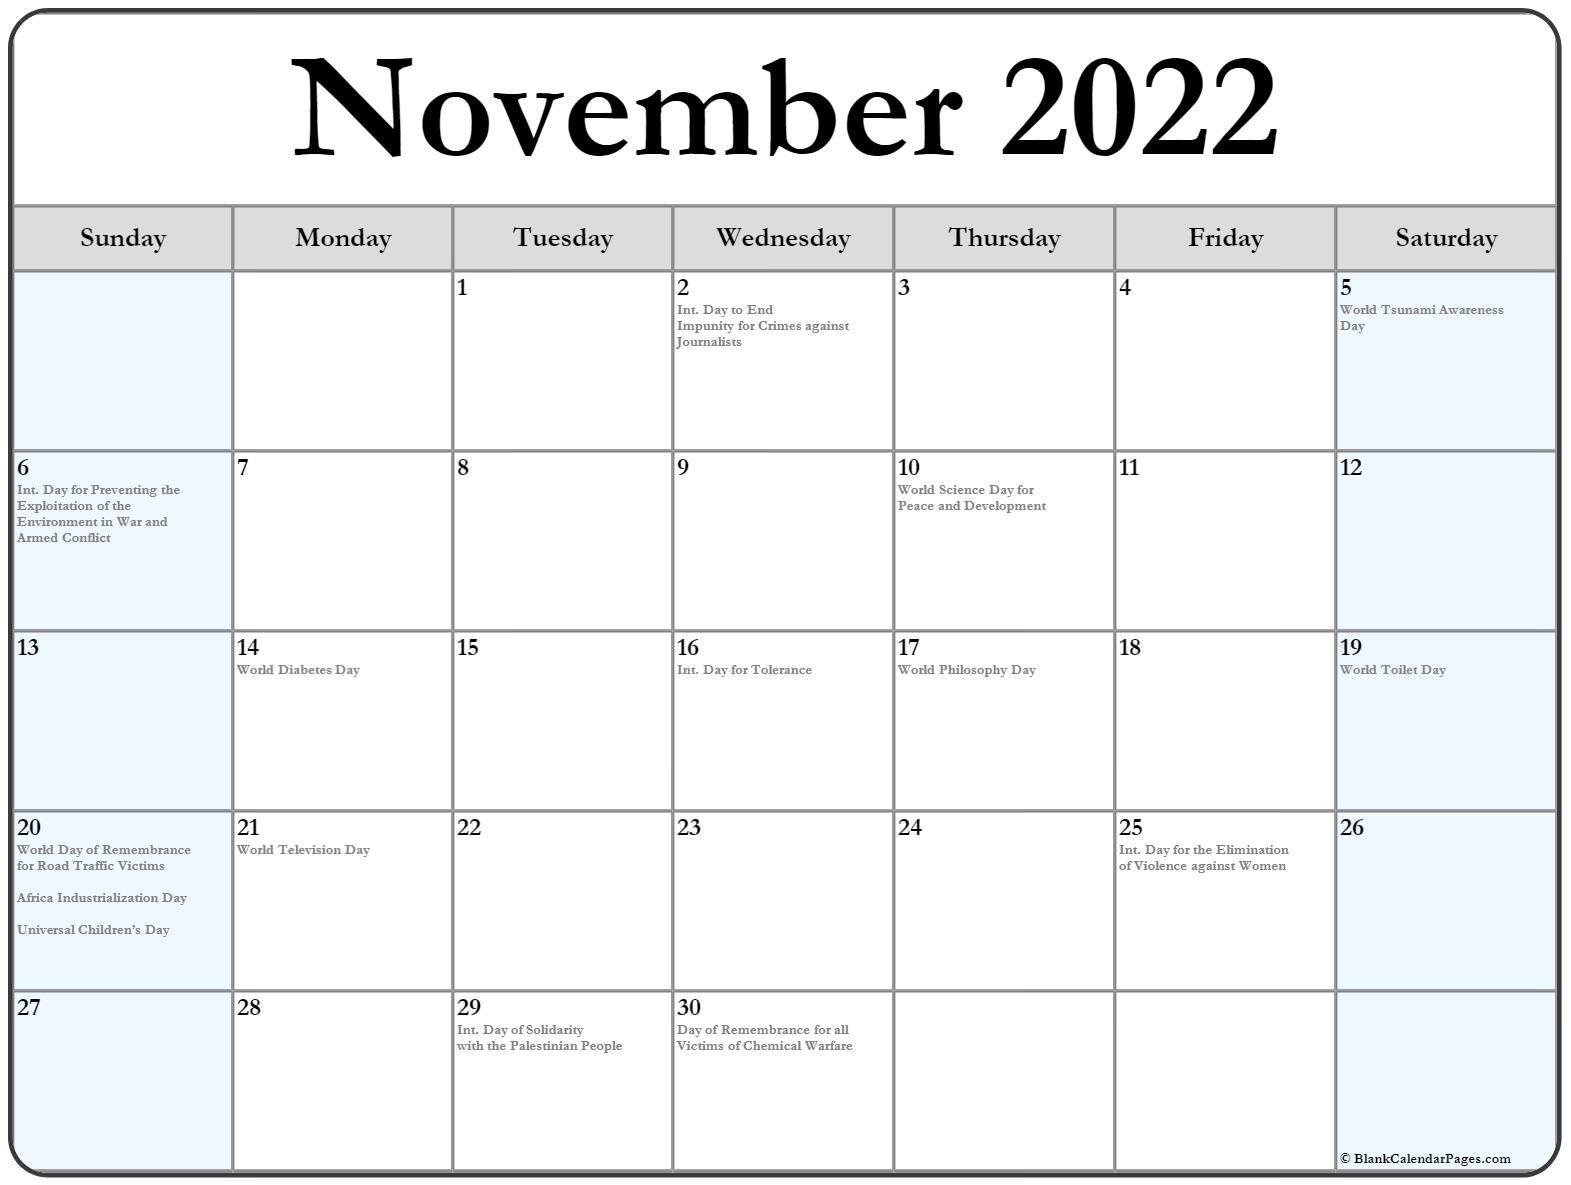 November 2020 with international holidays